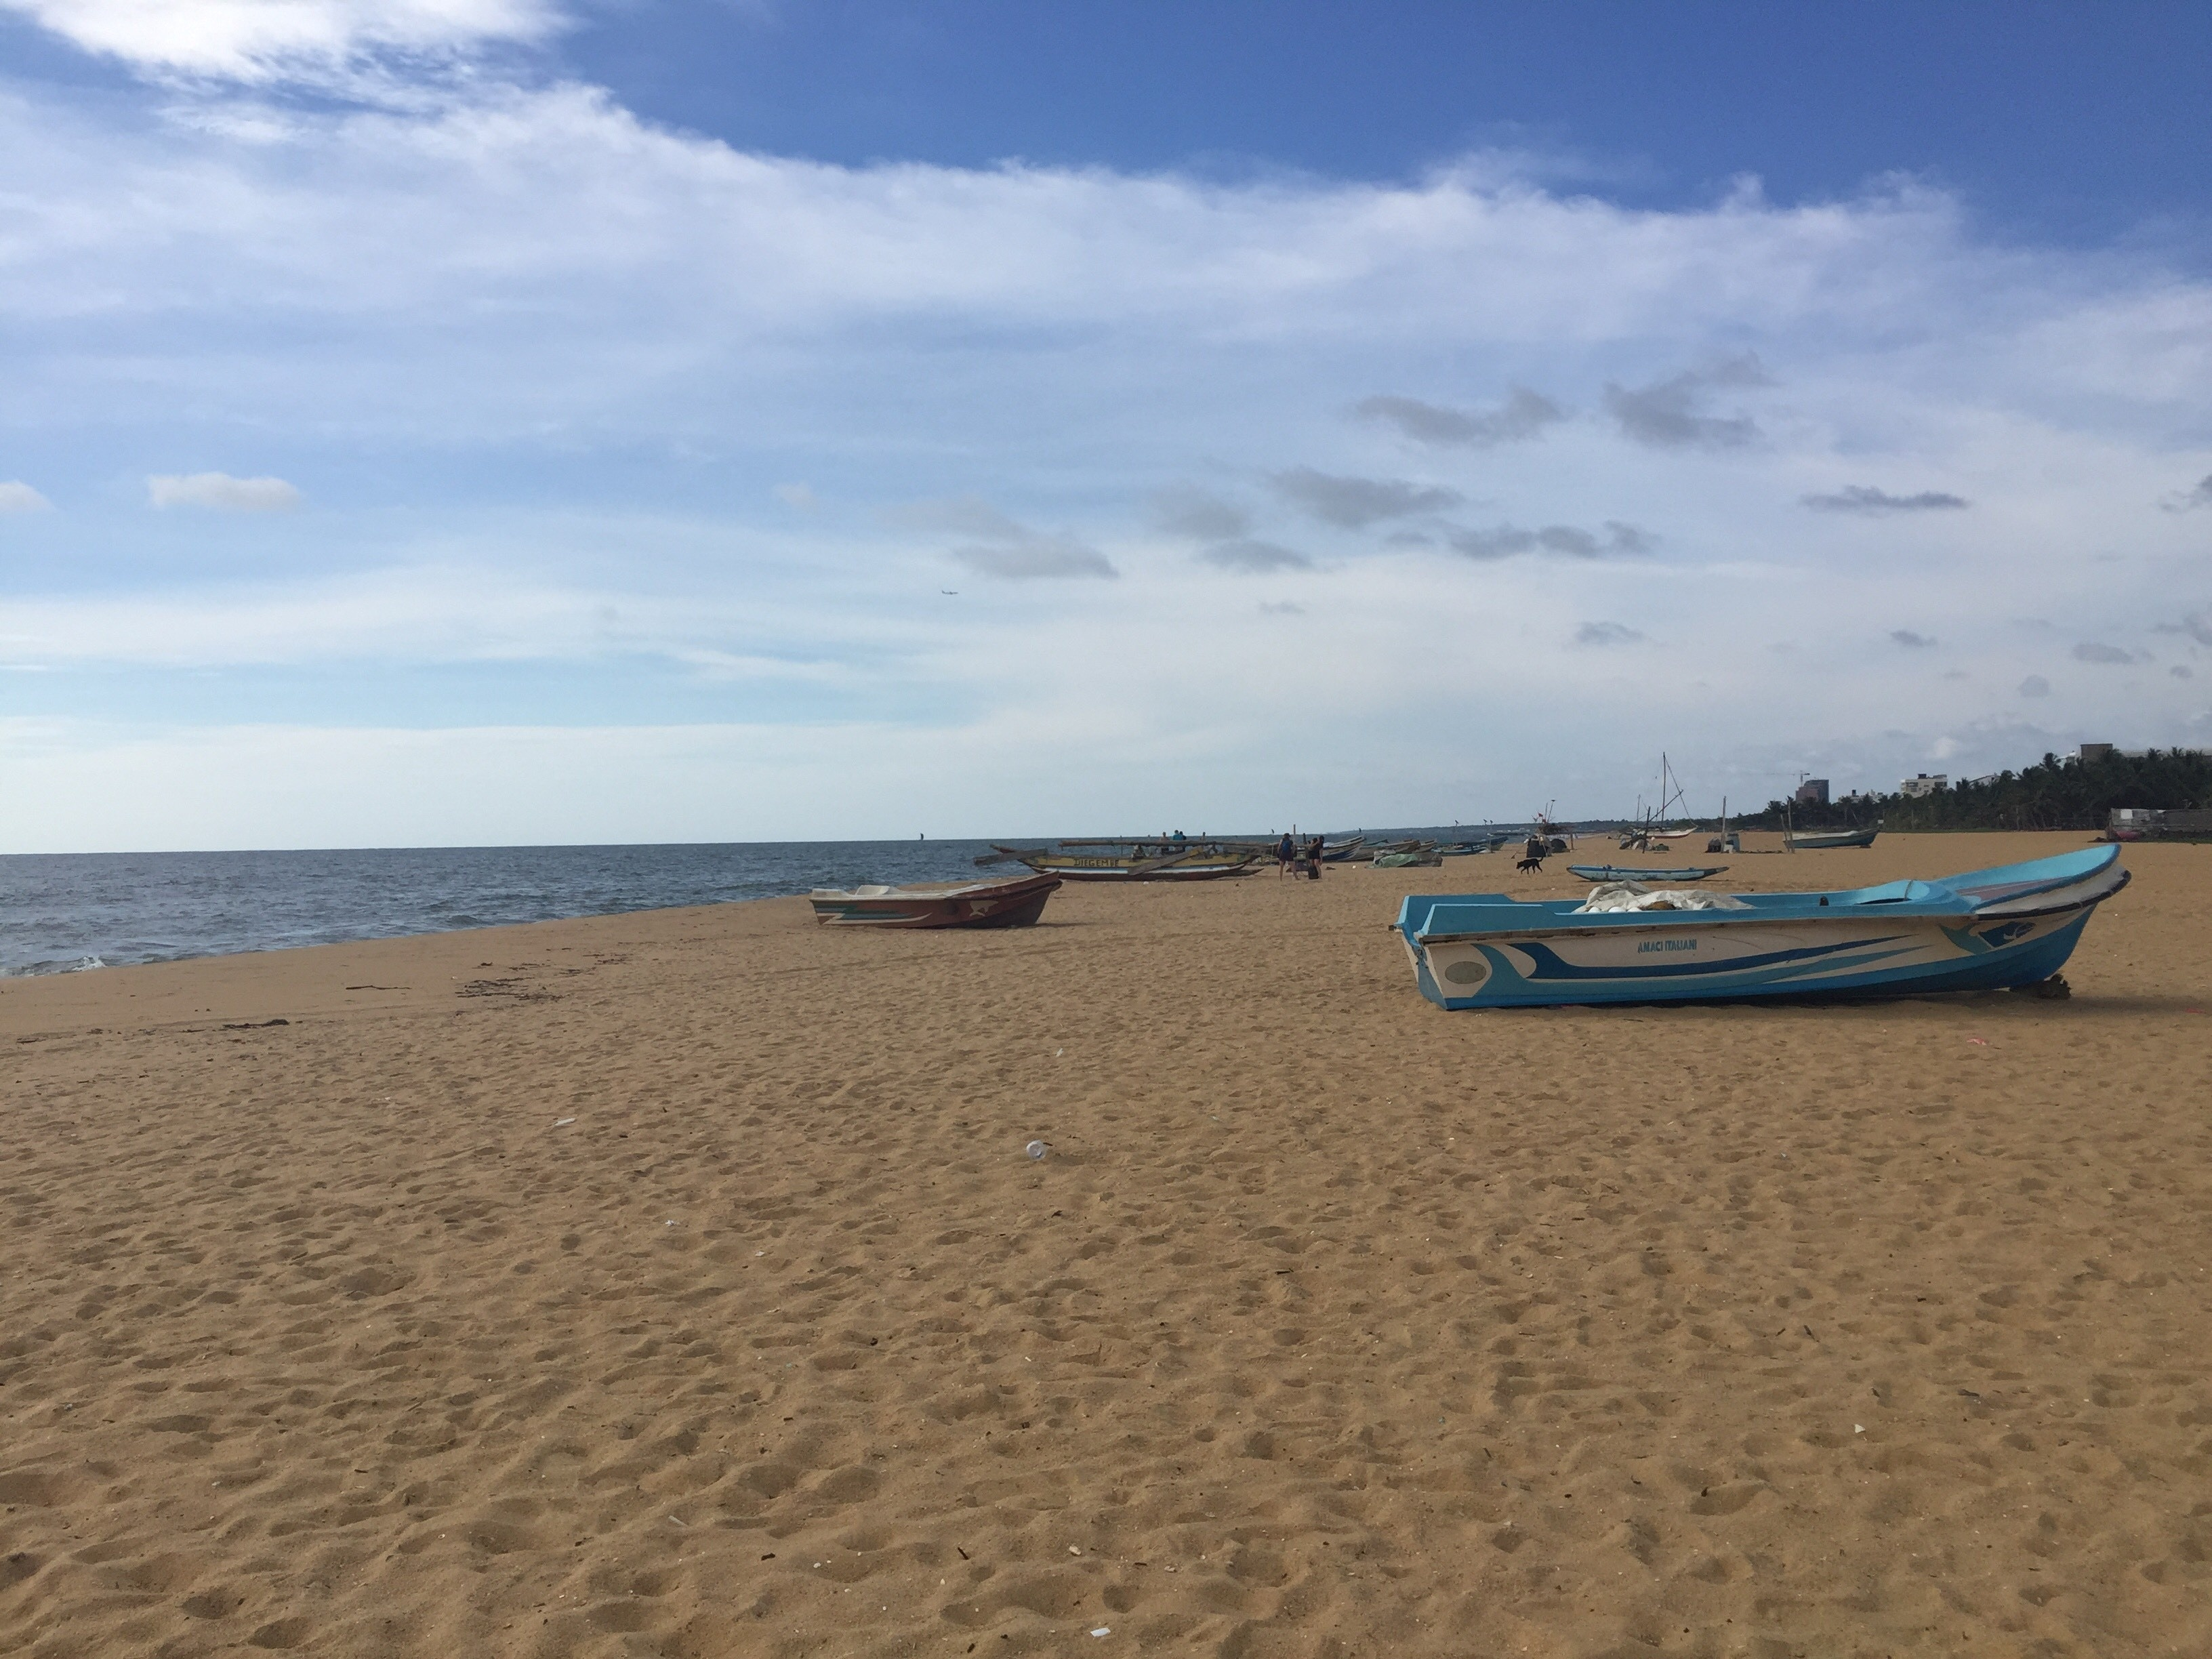 Strand van Negombo, Negombo, Western Province, Sri Lanka